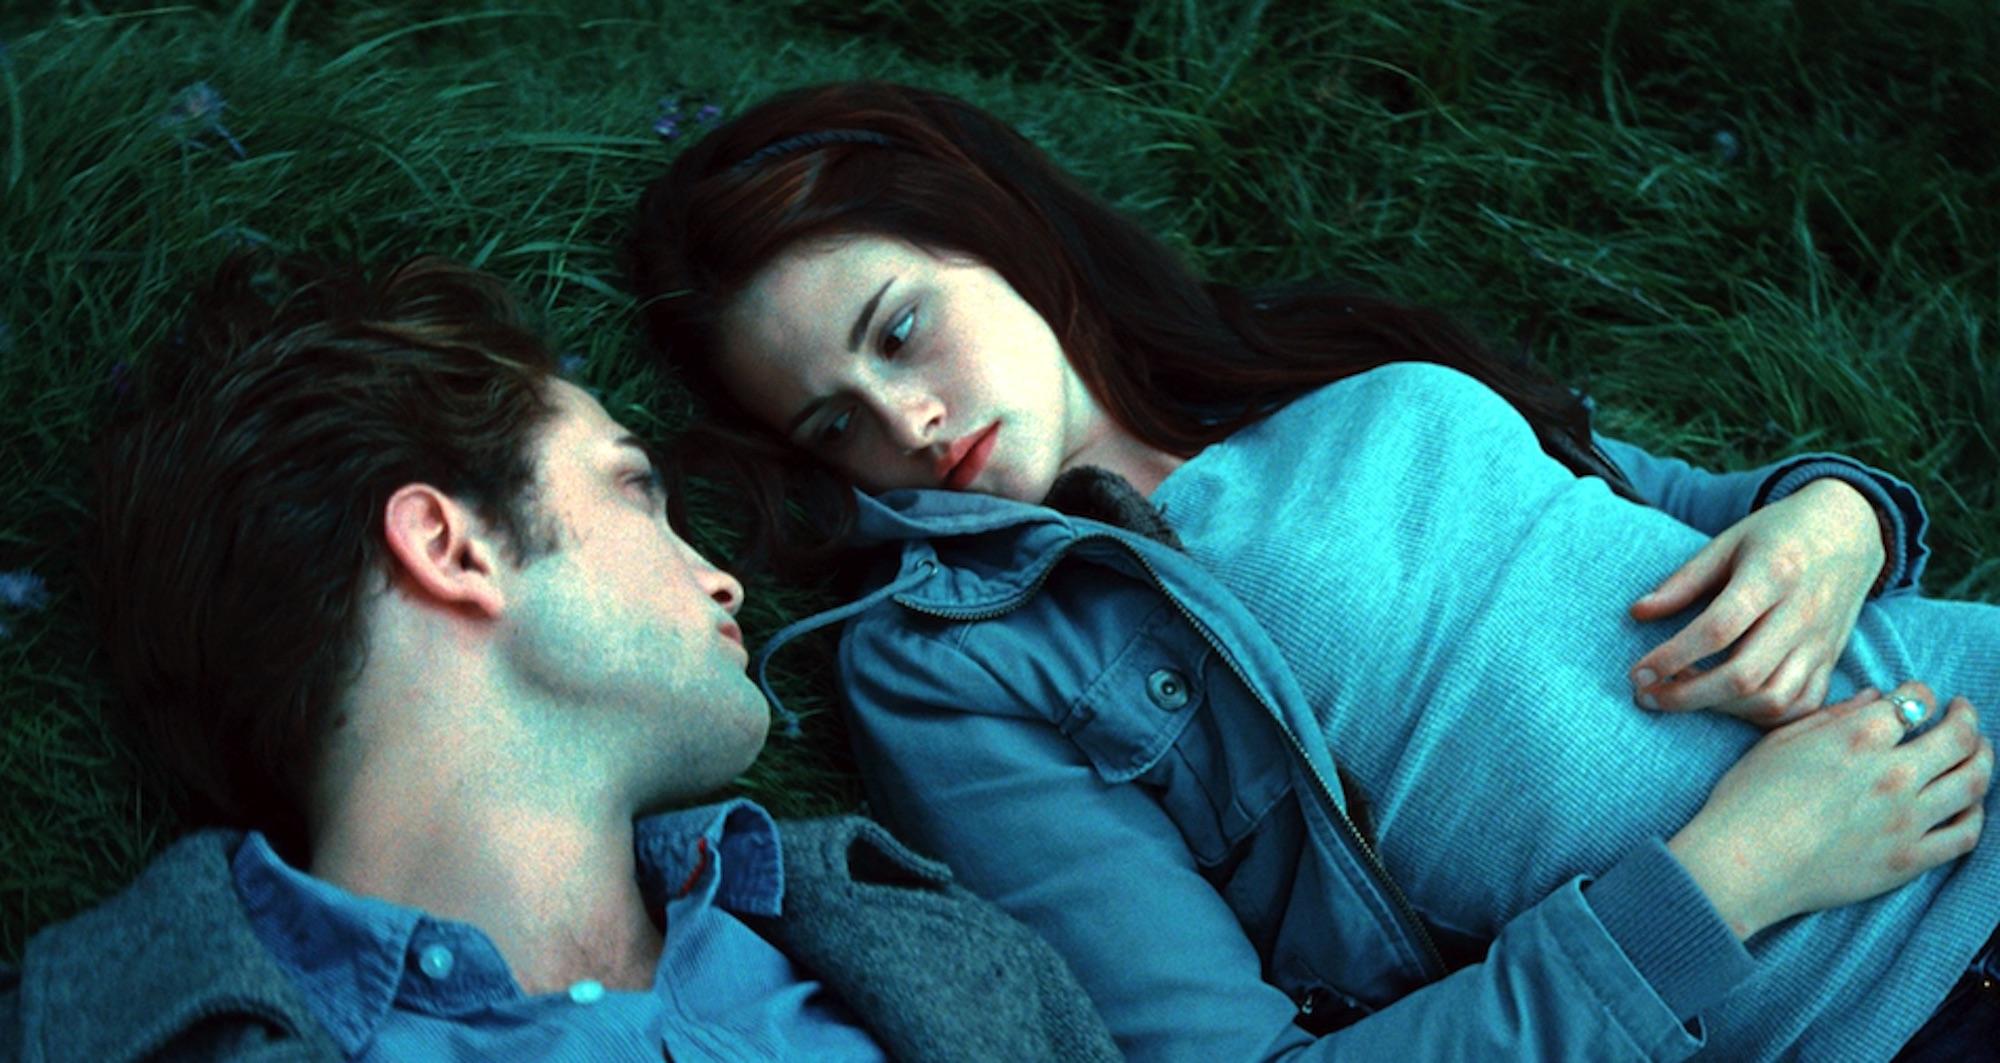 Edward Cullen (Robert Pattinson) and Bella Swan (Kristen Stewart) in his meadow in 'Twilight.'